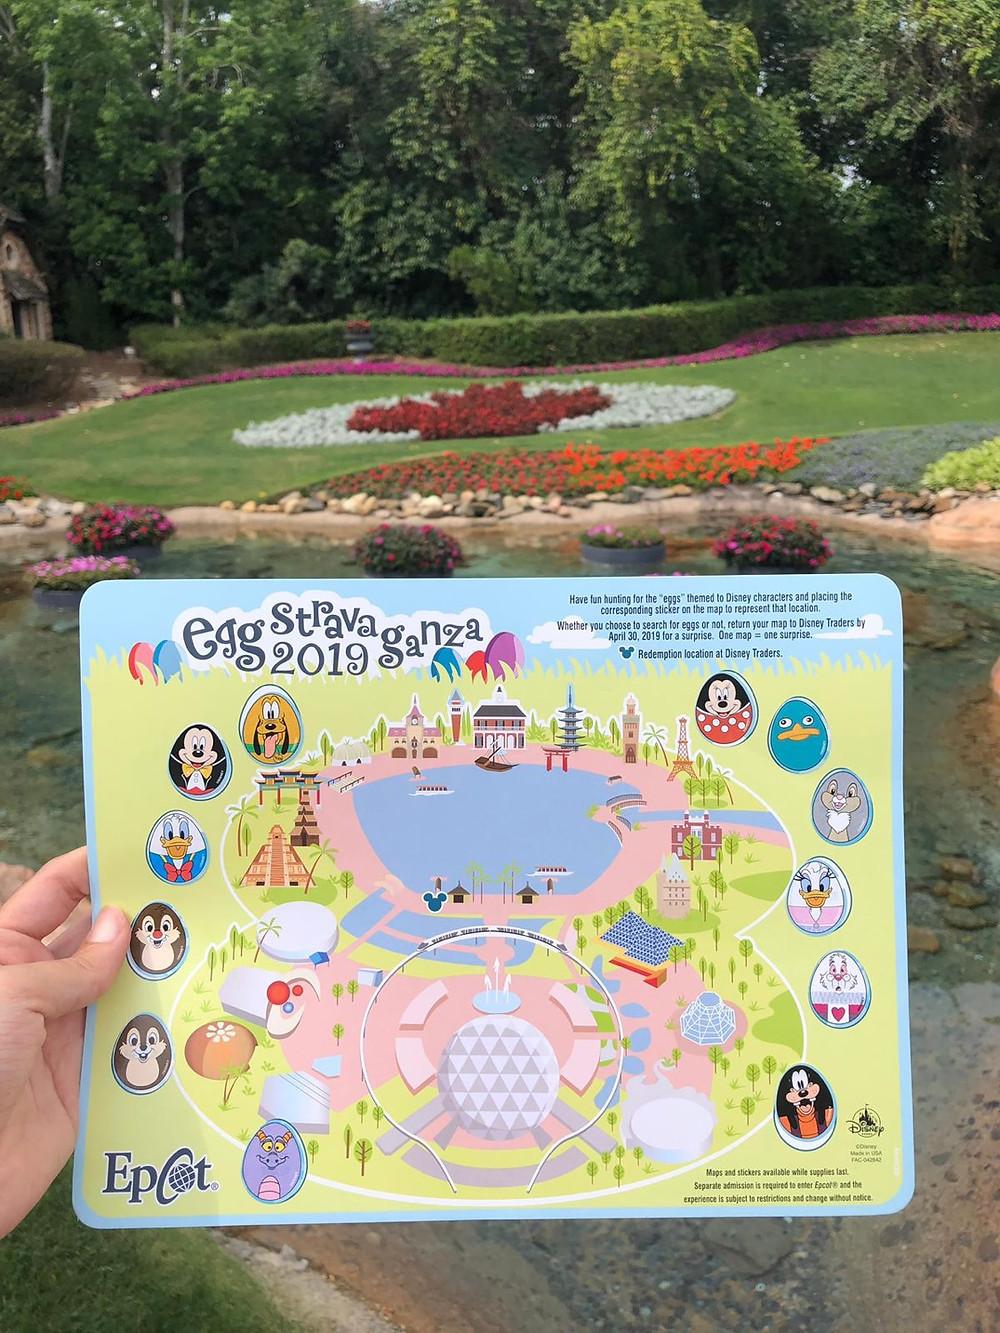 Eggstravaganza Epcot Flower and Garden Festival 2019